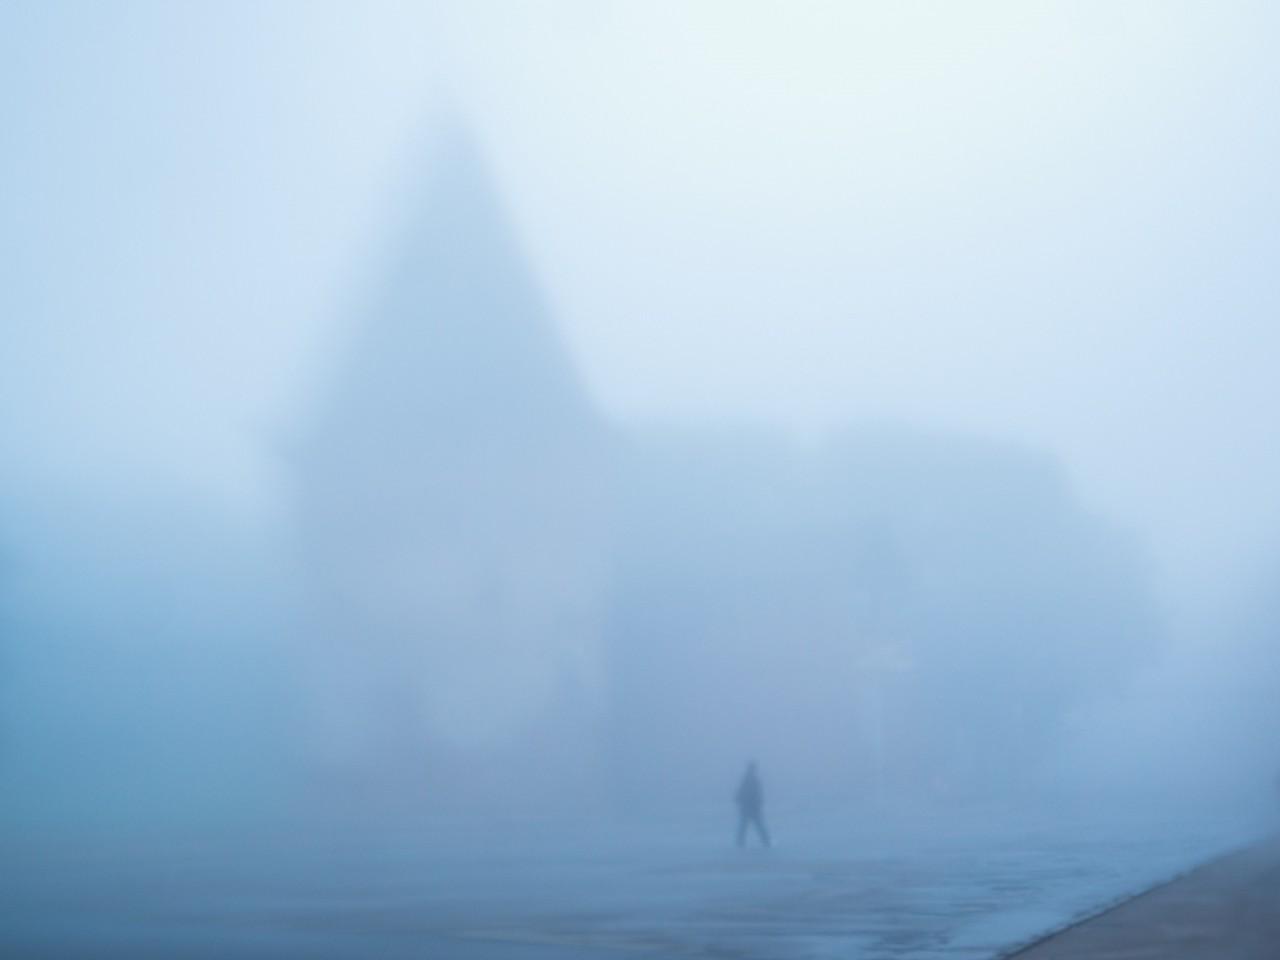 туман, Громовая башня (фото vk.com poresh1)